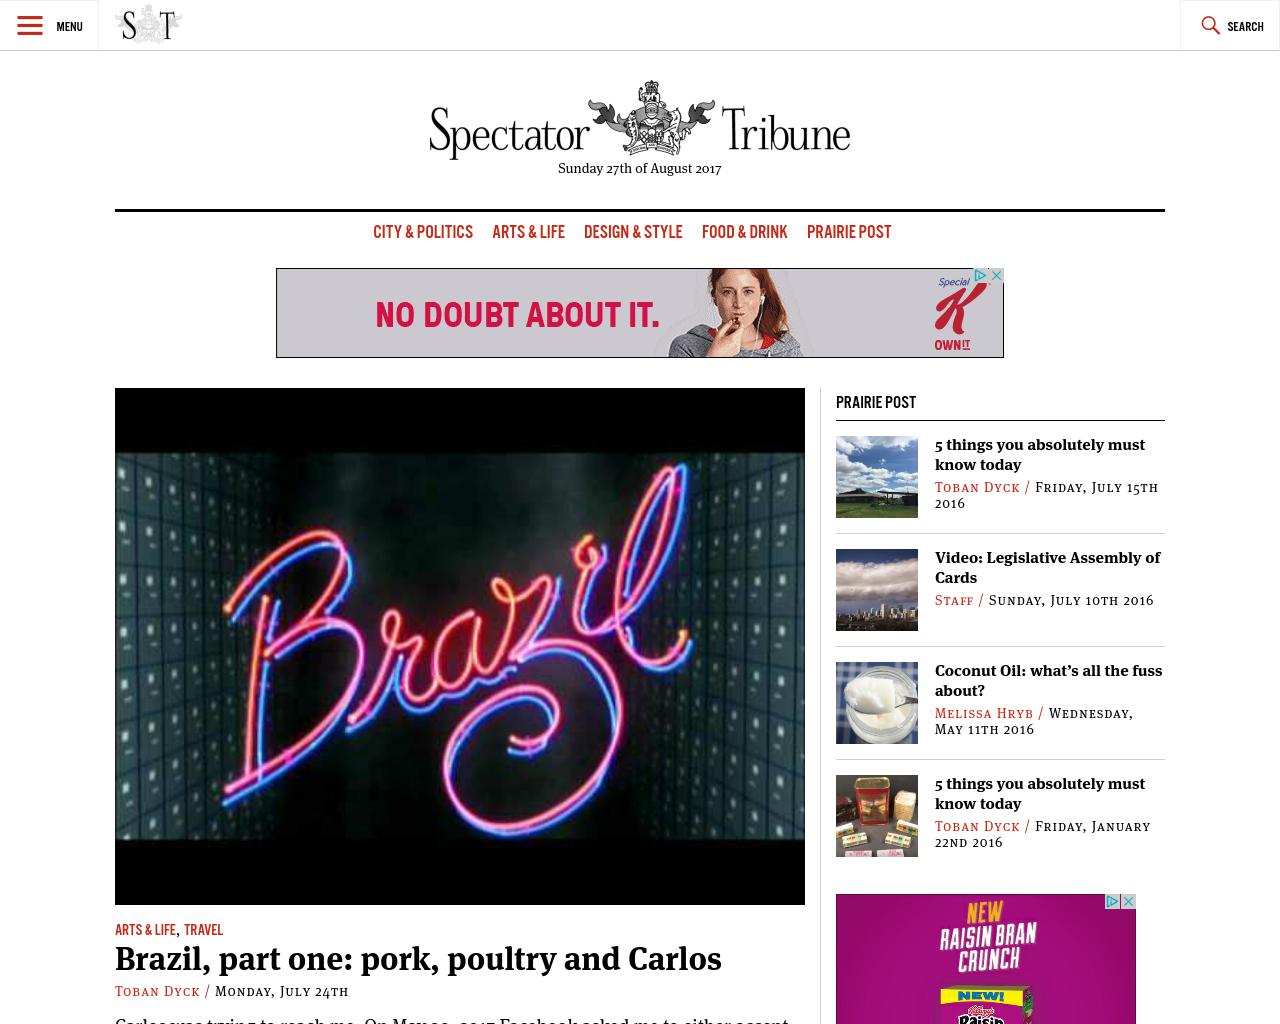 Spectators-Tribune-Advertising-Reviews-Pricing